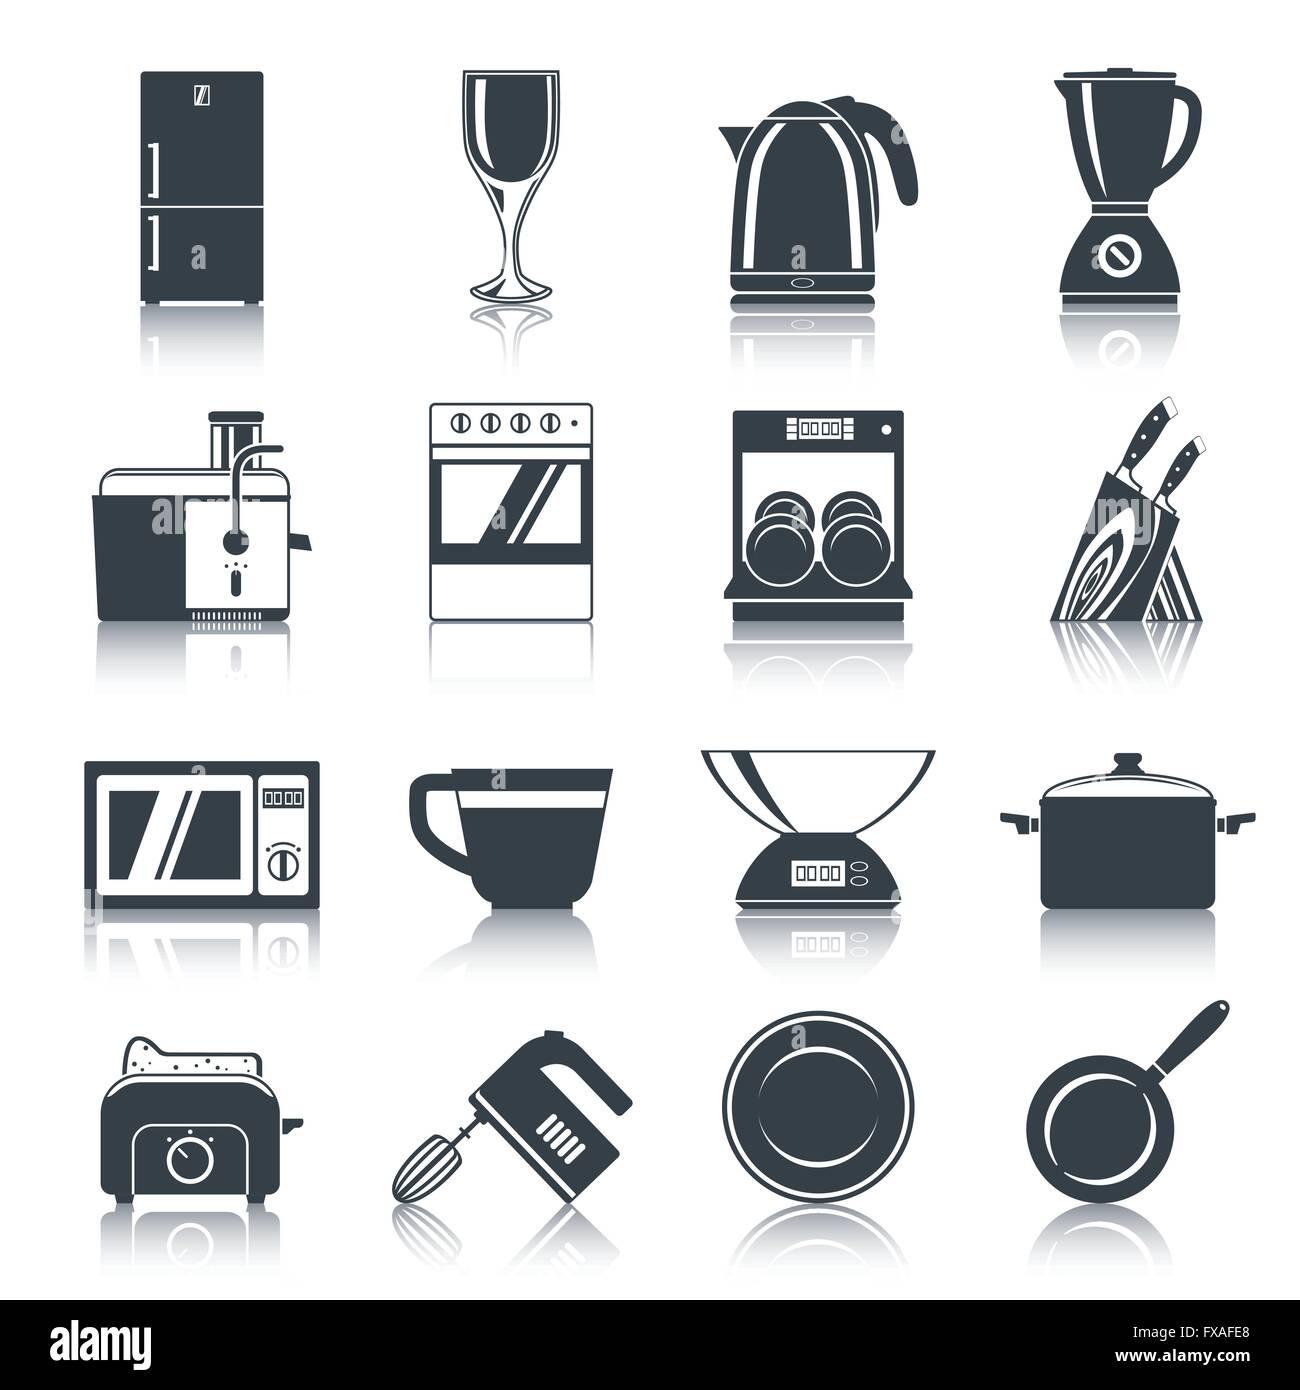 Kitchen Appliances Icons Black Stock Vector Art Illustration